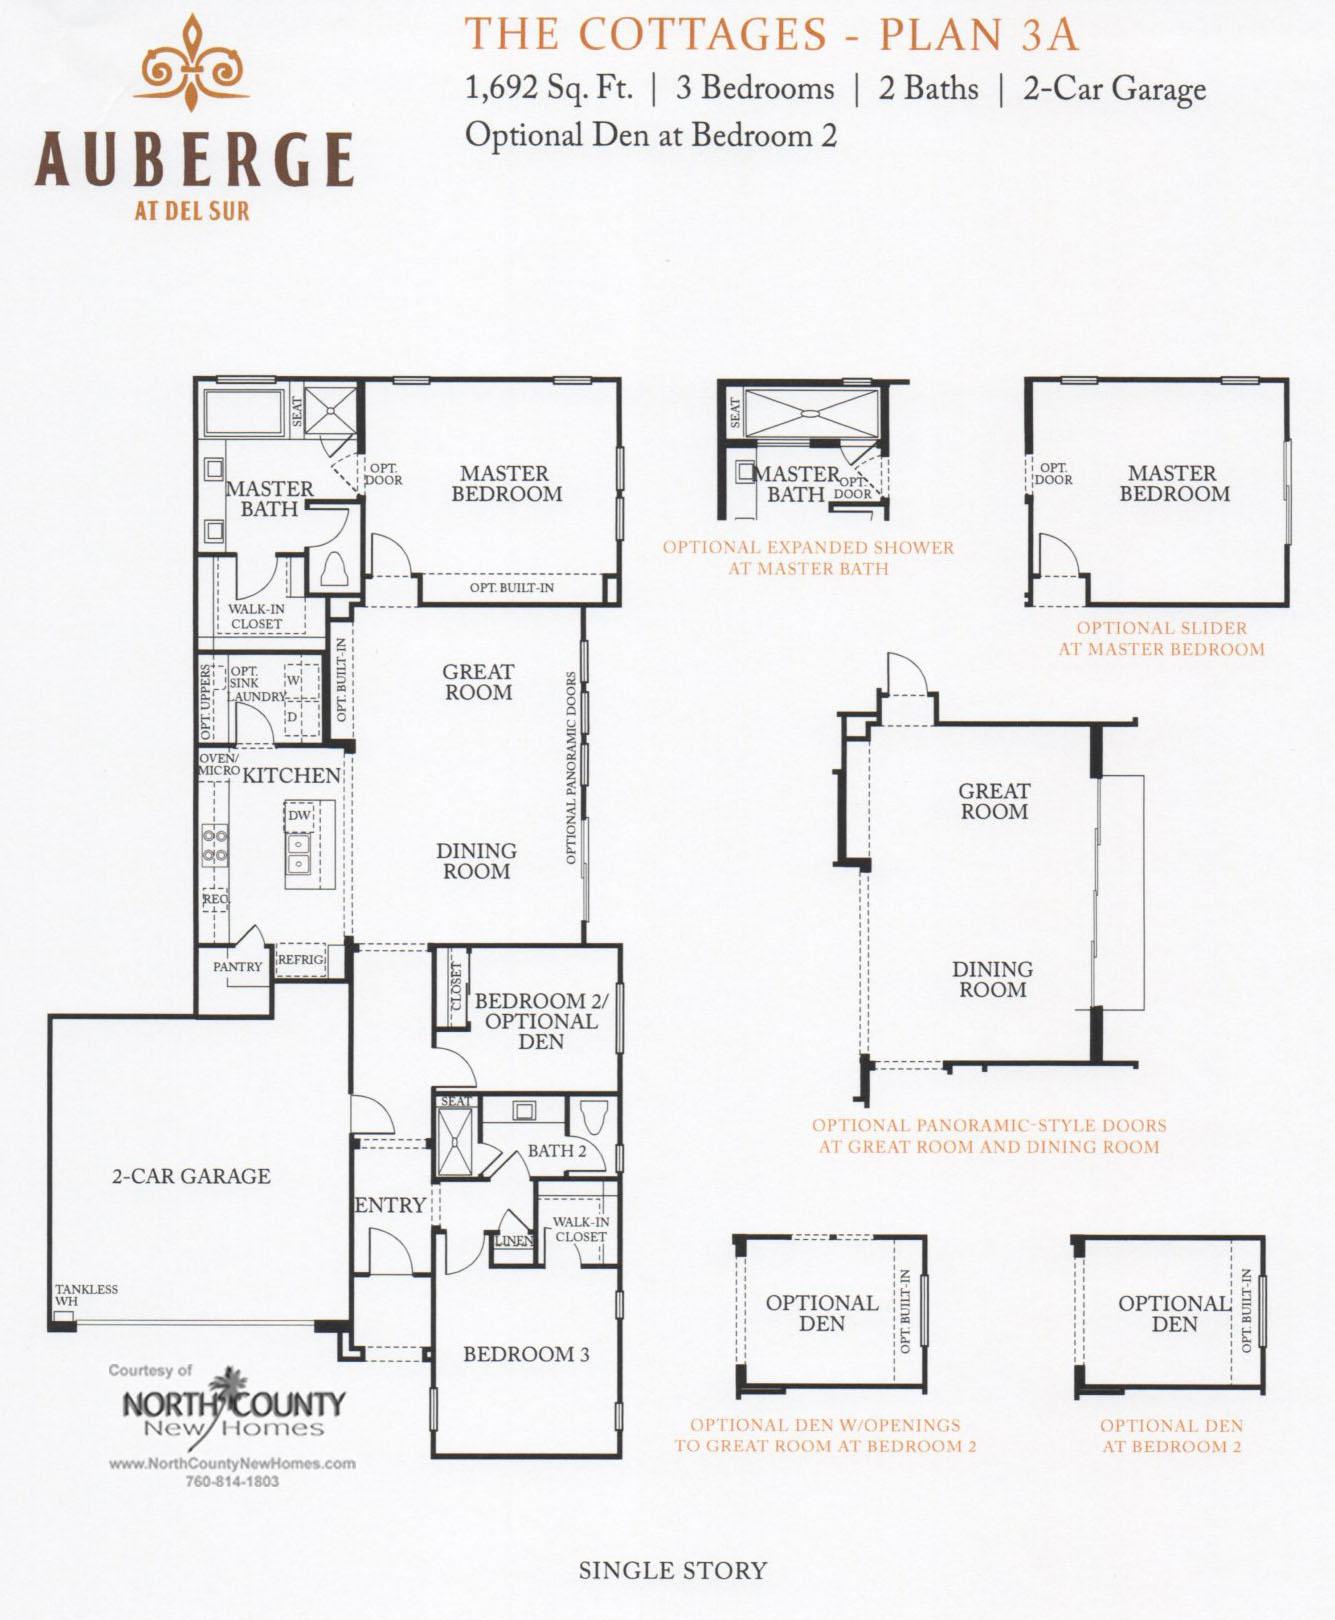 Auberge At Del Sur The Cottages Floor Plans New Homes